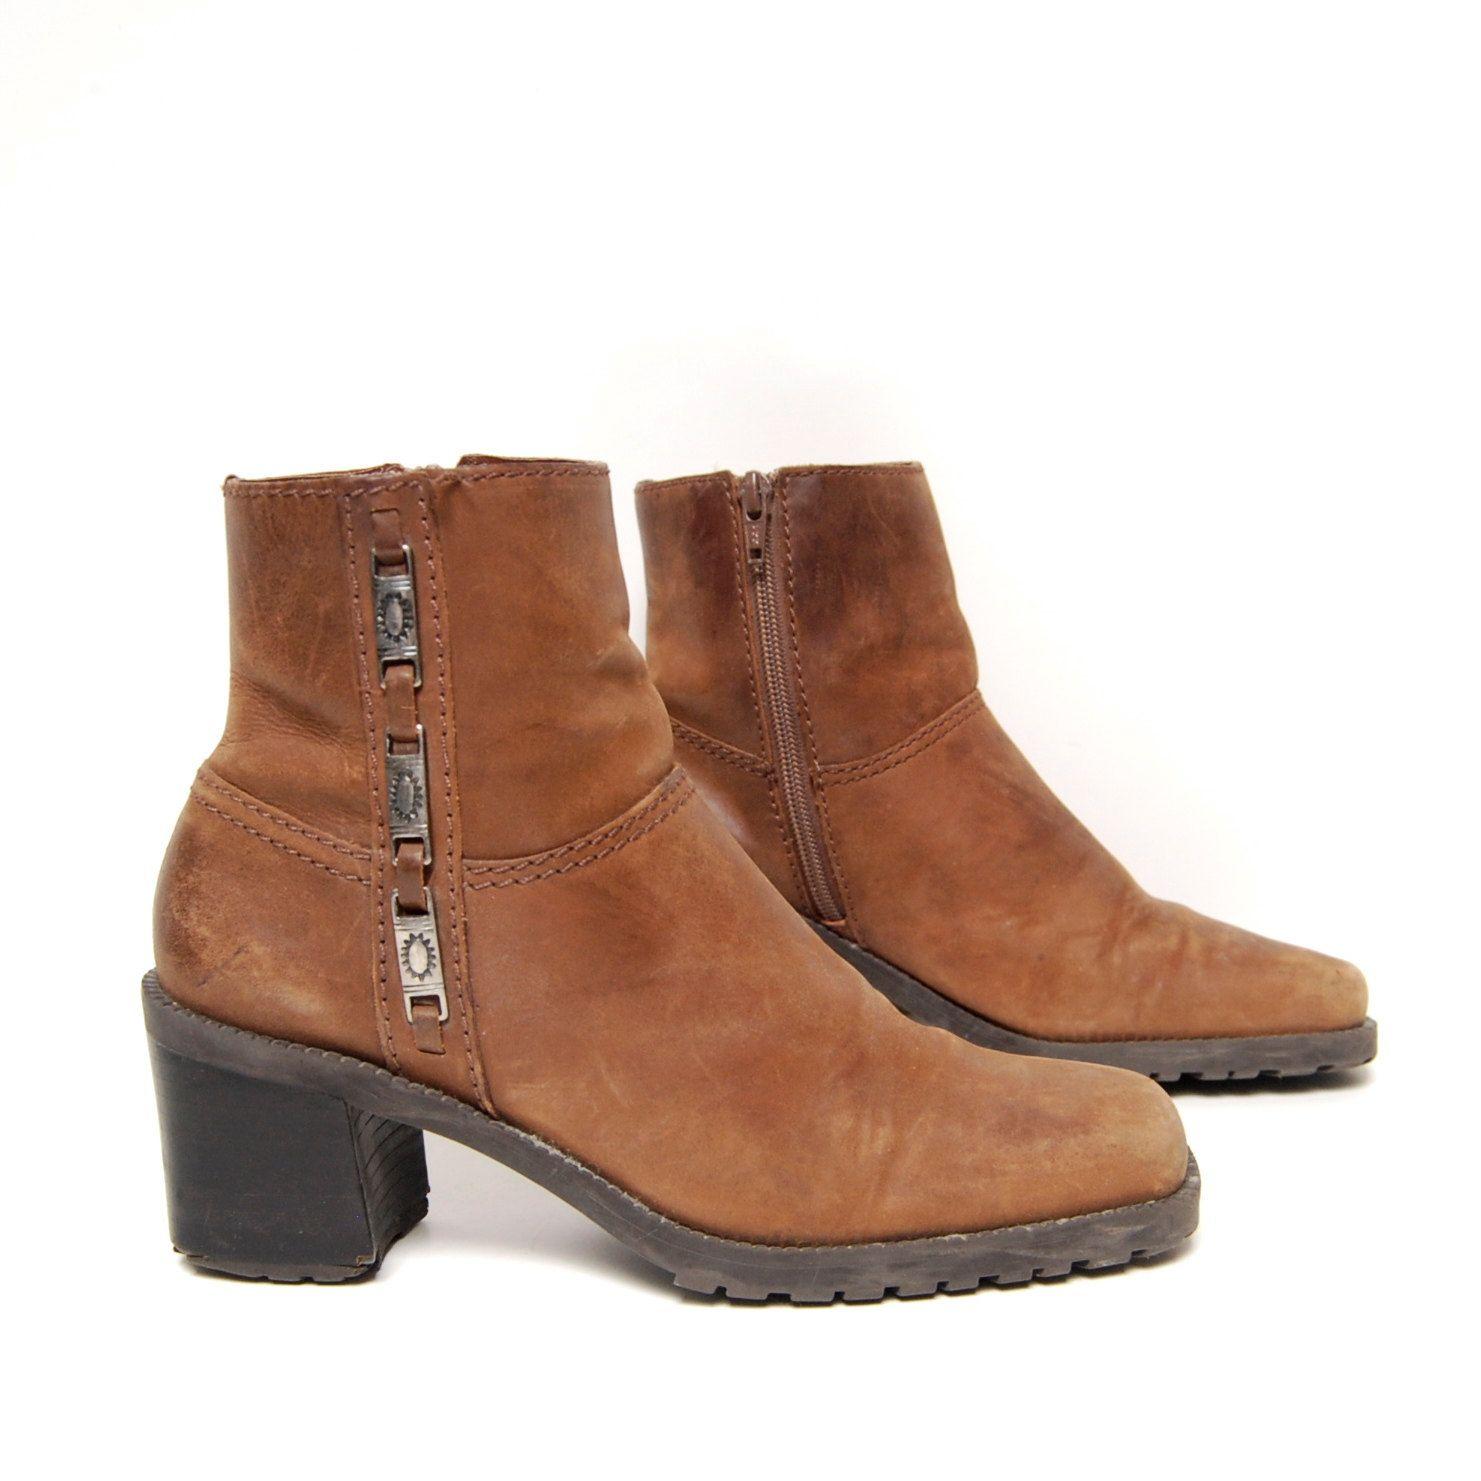 size 7 PLATFORM brown leather 80s 90s SOUTHWEST by 20twentyvintage